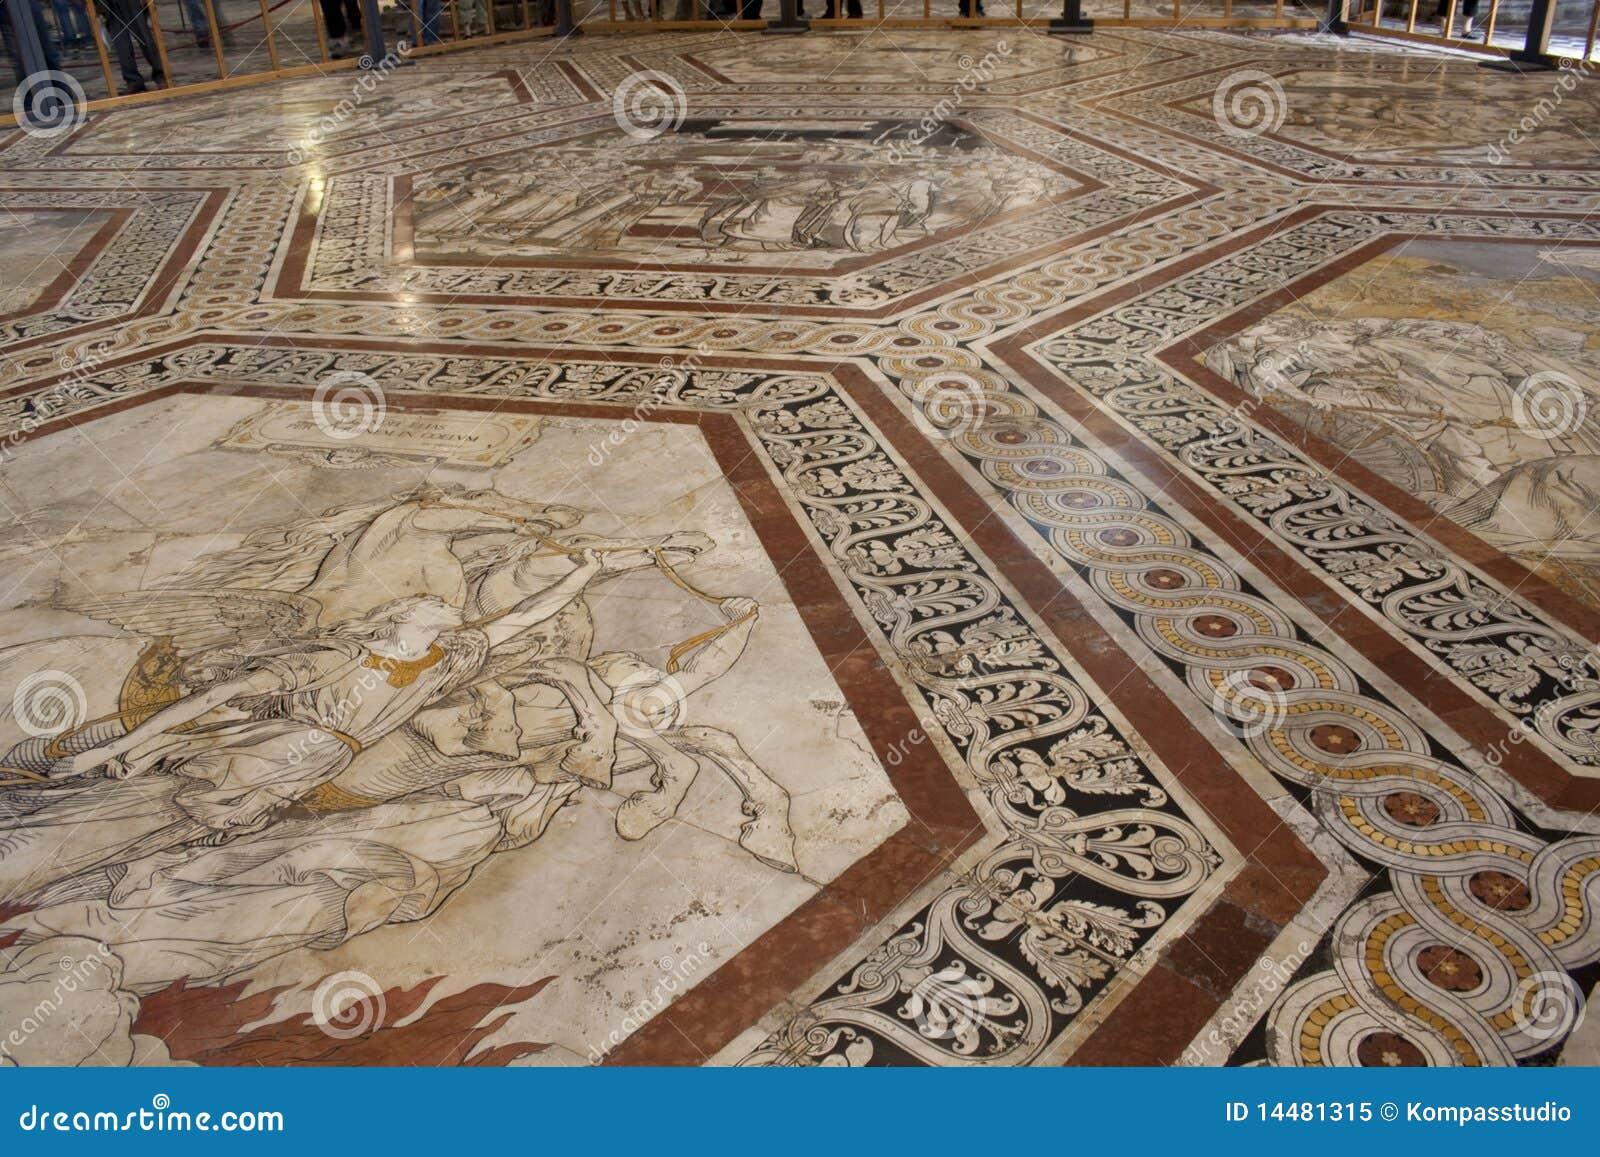 Vatican Museum Floor Plan Floor Of The Cathedral In Siena Royalty Free Stock Photo